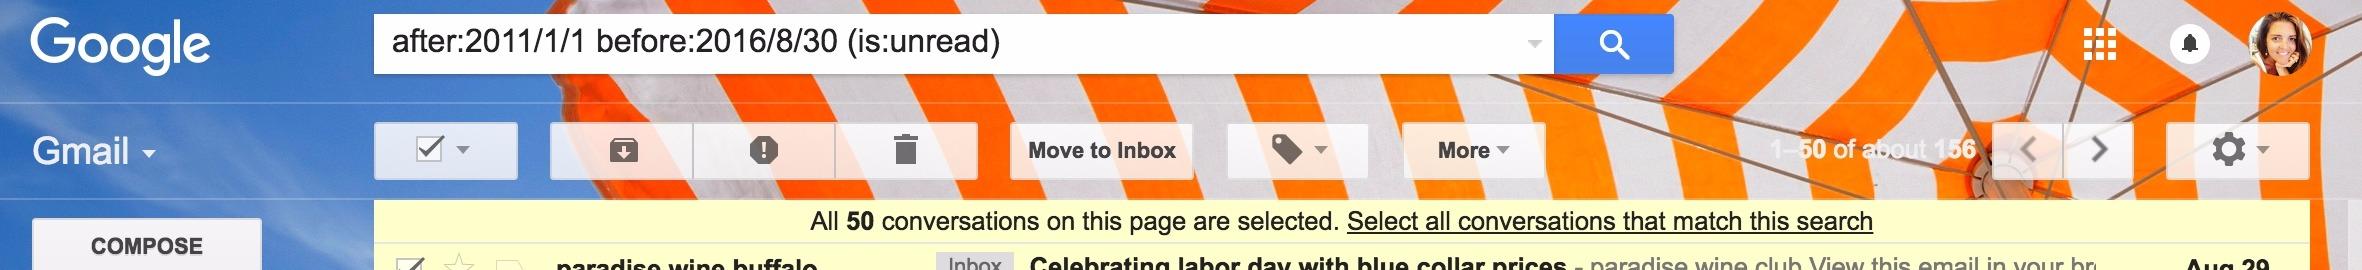 GmailDeleteScreenshot